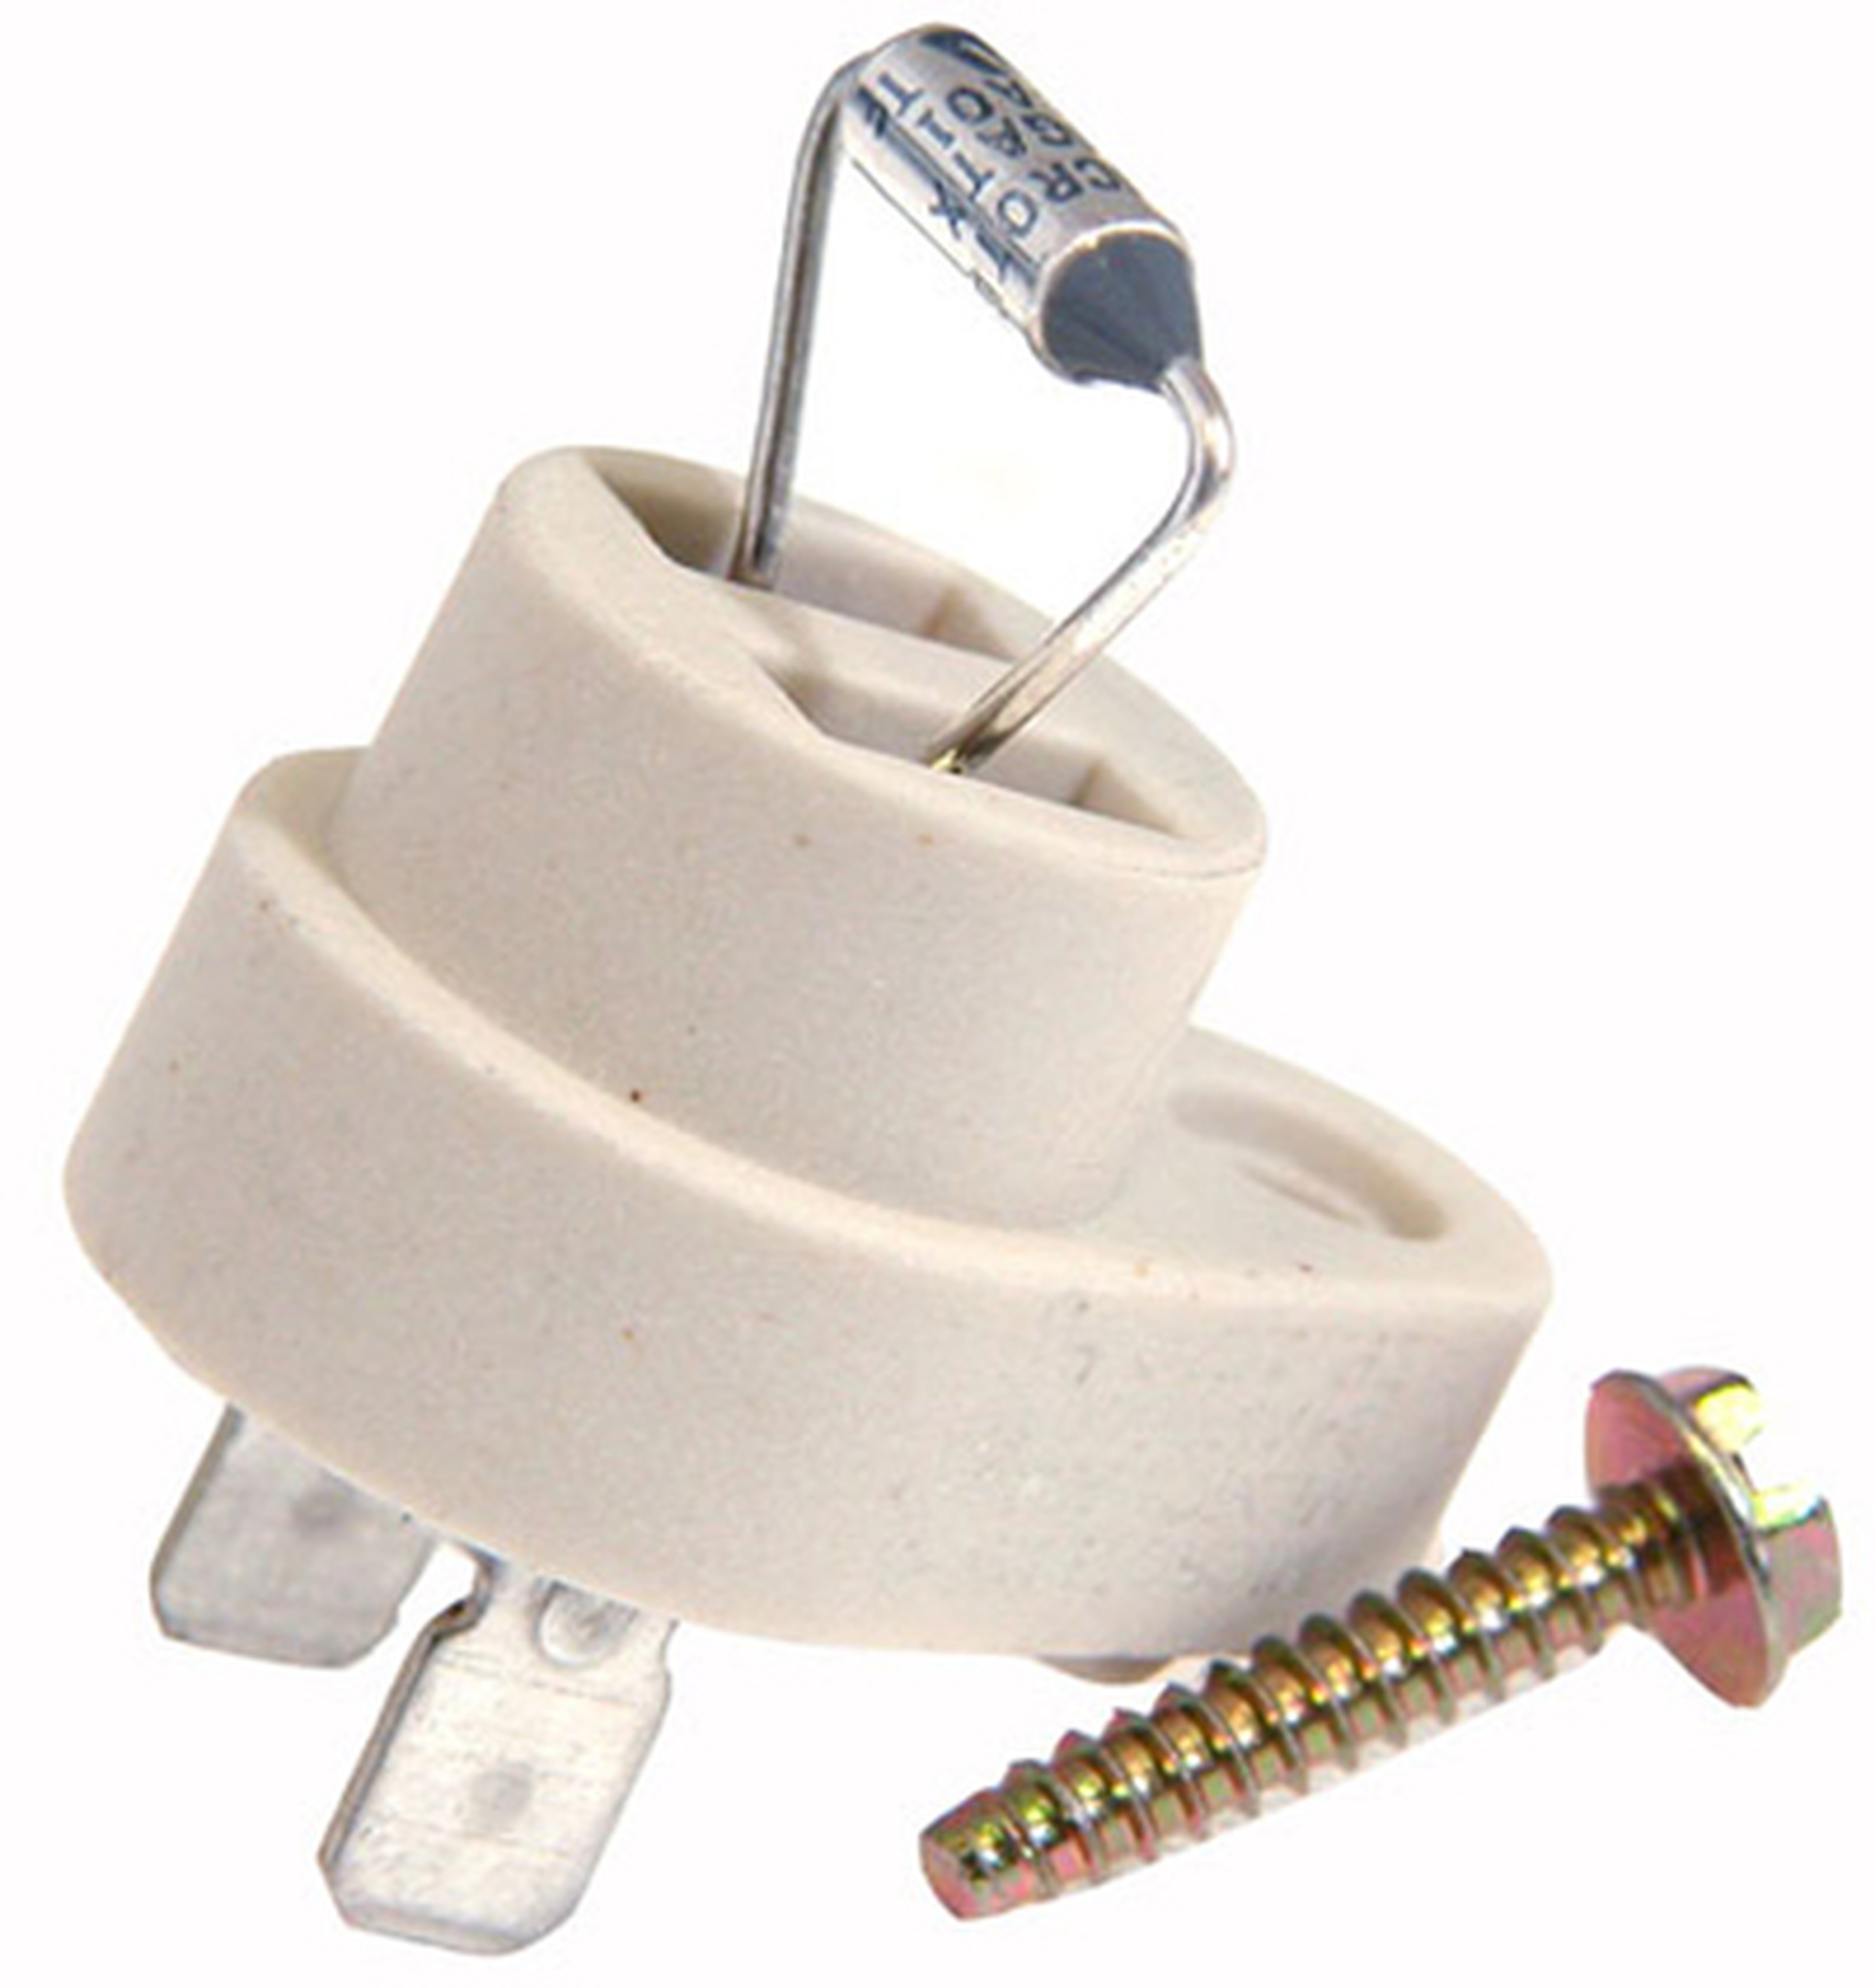 Raypak RP2100 Parts